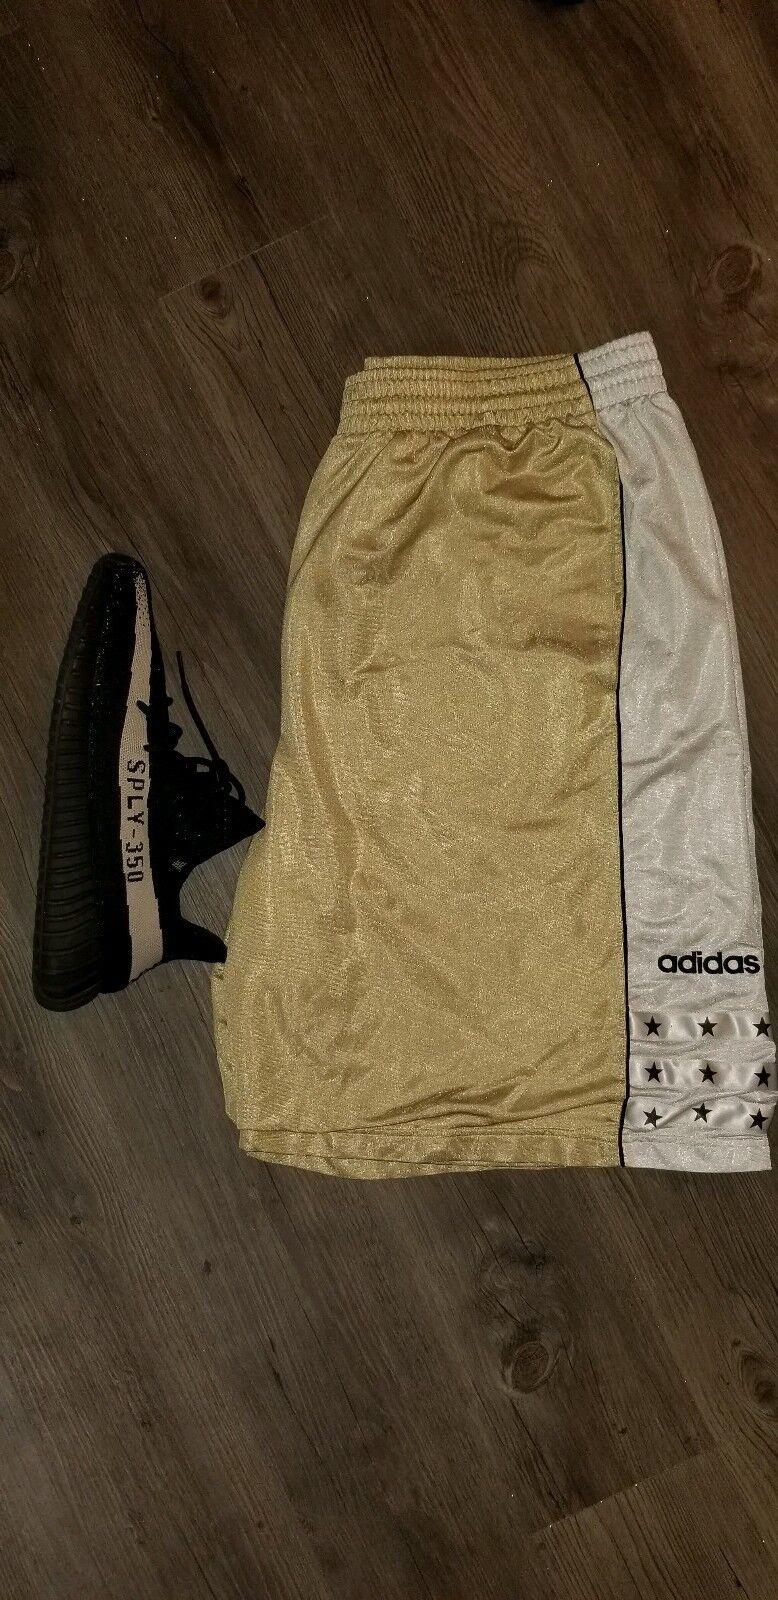 "Adidas Vintage ~ Ξ§ΟΟ…ΟƒΟŒ ΞœΟ€Ξ¬ΟƒΞΊΞ΅Ο"" Σορτς Ξ'Ξ½Ξ΄ΟΞΉΞΊΟŒ ΞœΞΞ³Ξ΅ΞΈΞΏΟ' xxl"